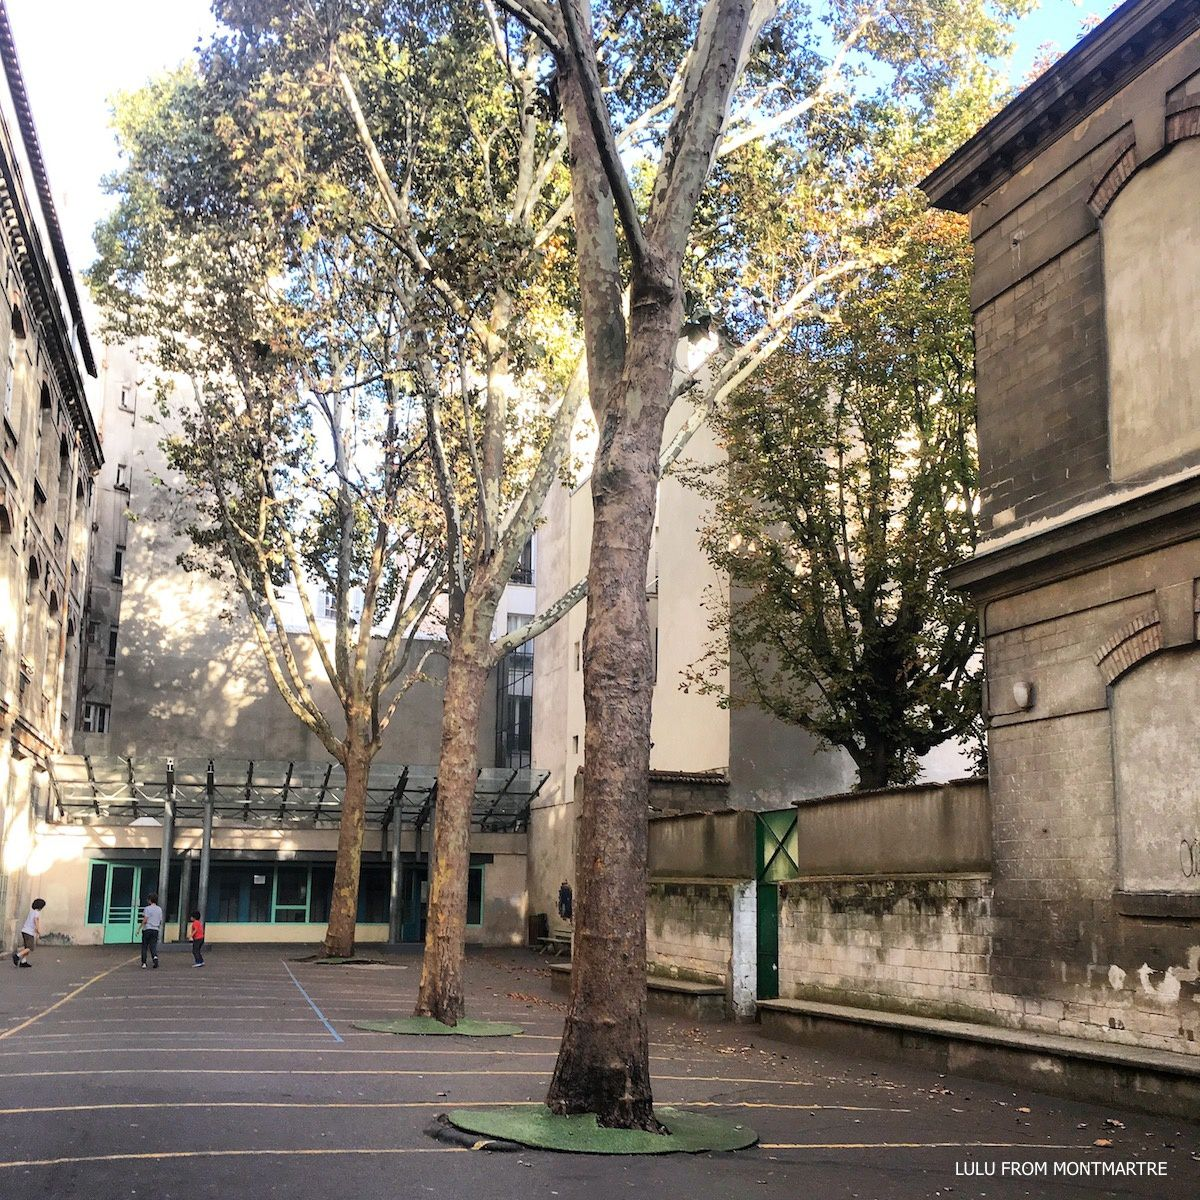 04. Collège montmartrois, 75018